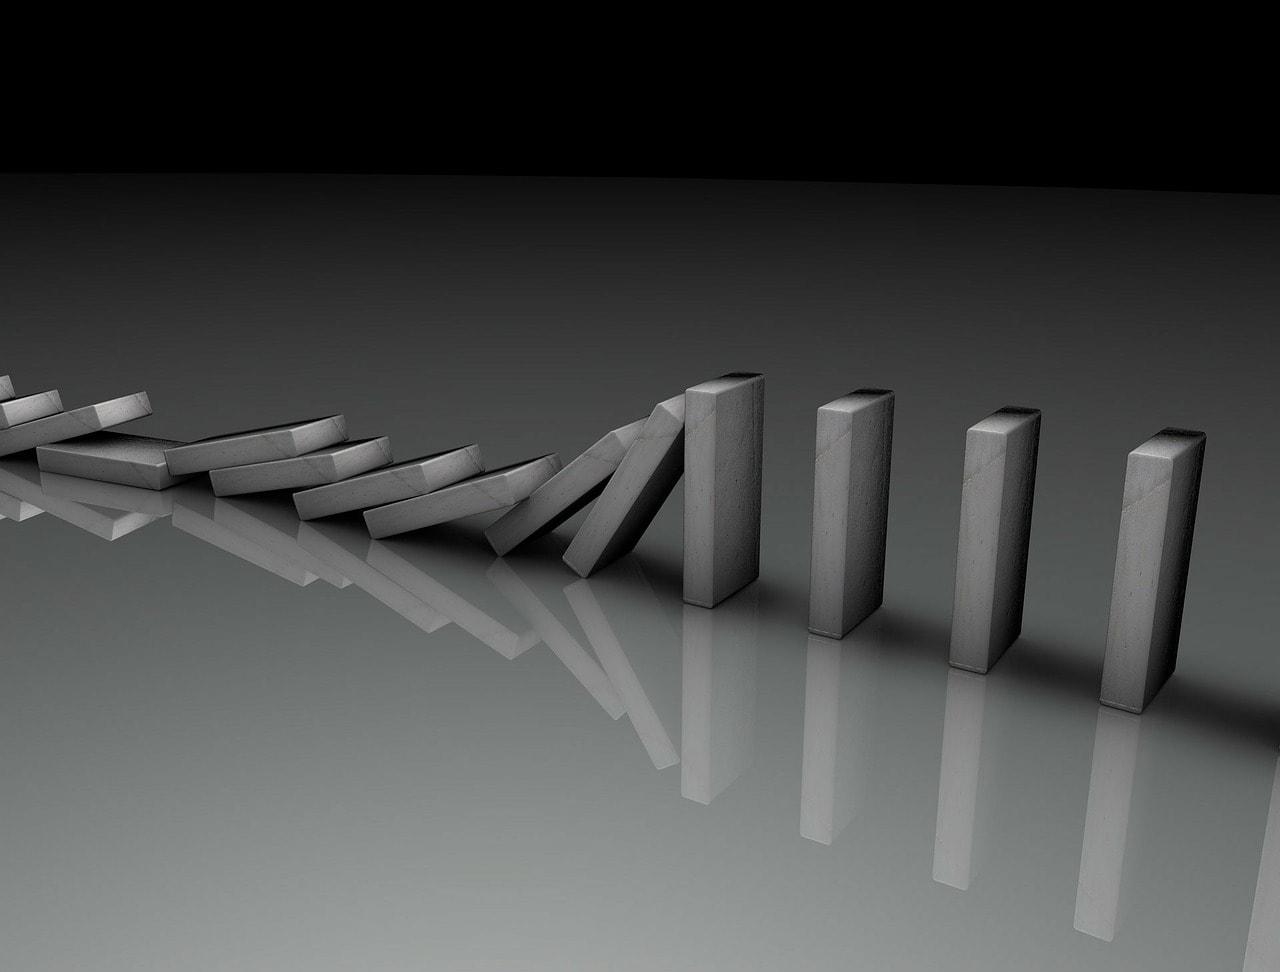 Domino - Domino effect